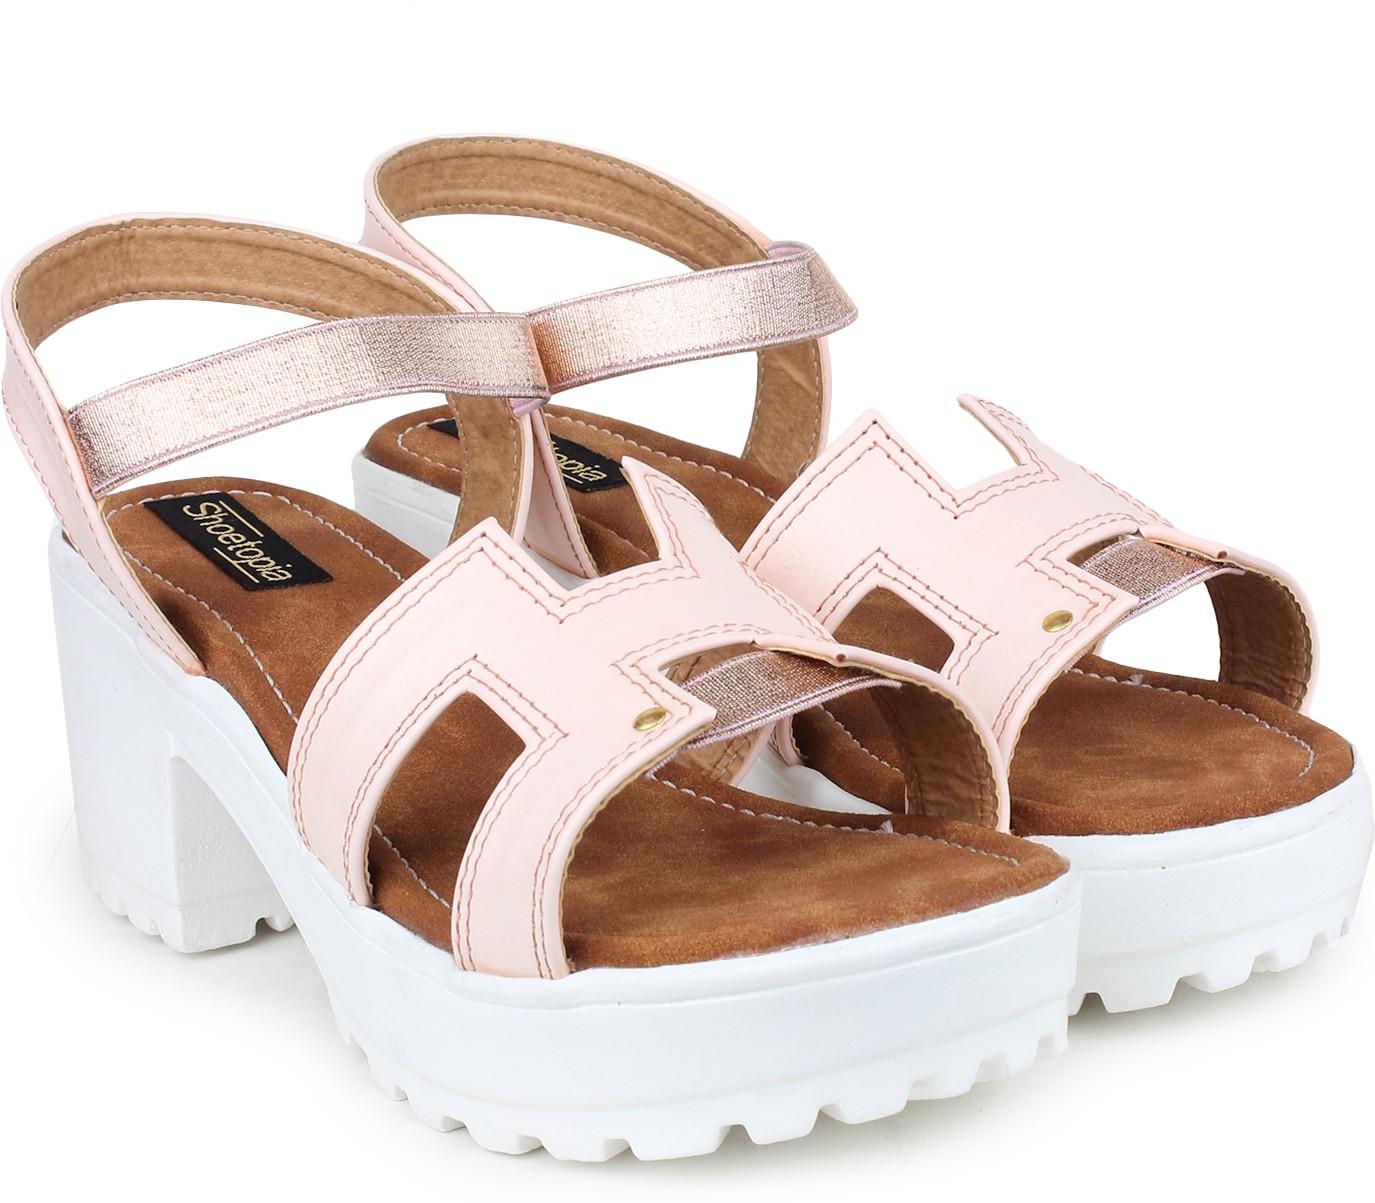 Deals - Bangalore - Block Heels <br> Carlton London, Mochi...<br> Category - footwear<br> Business - Flipkart.com